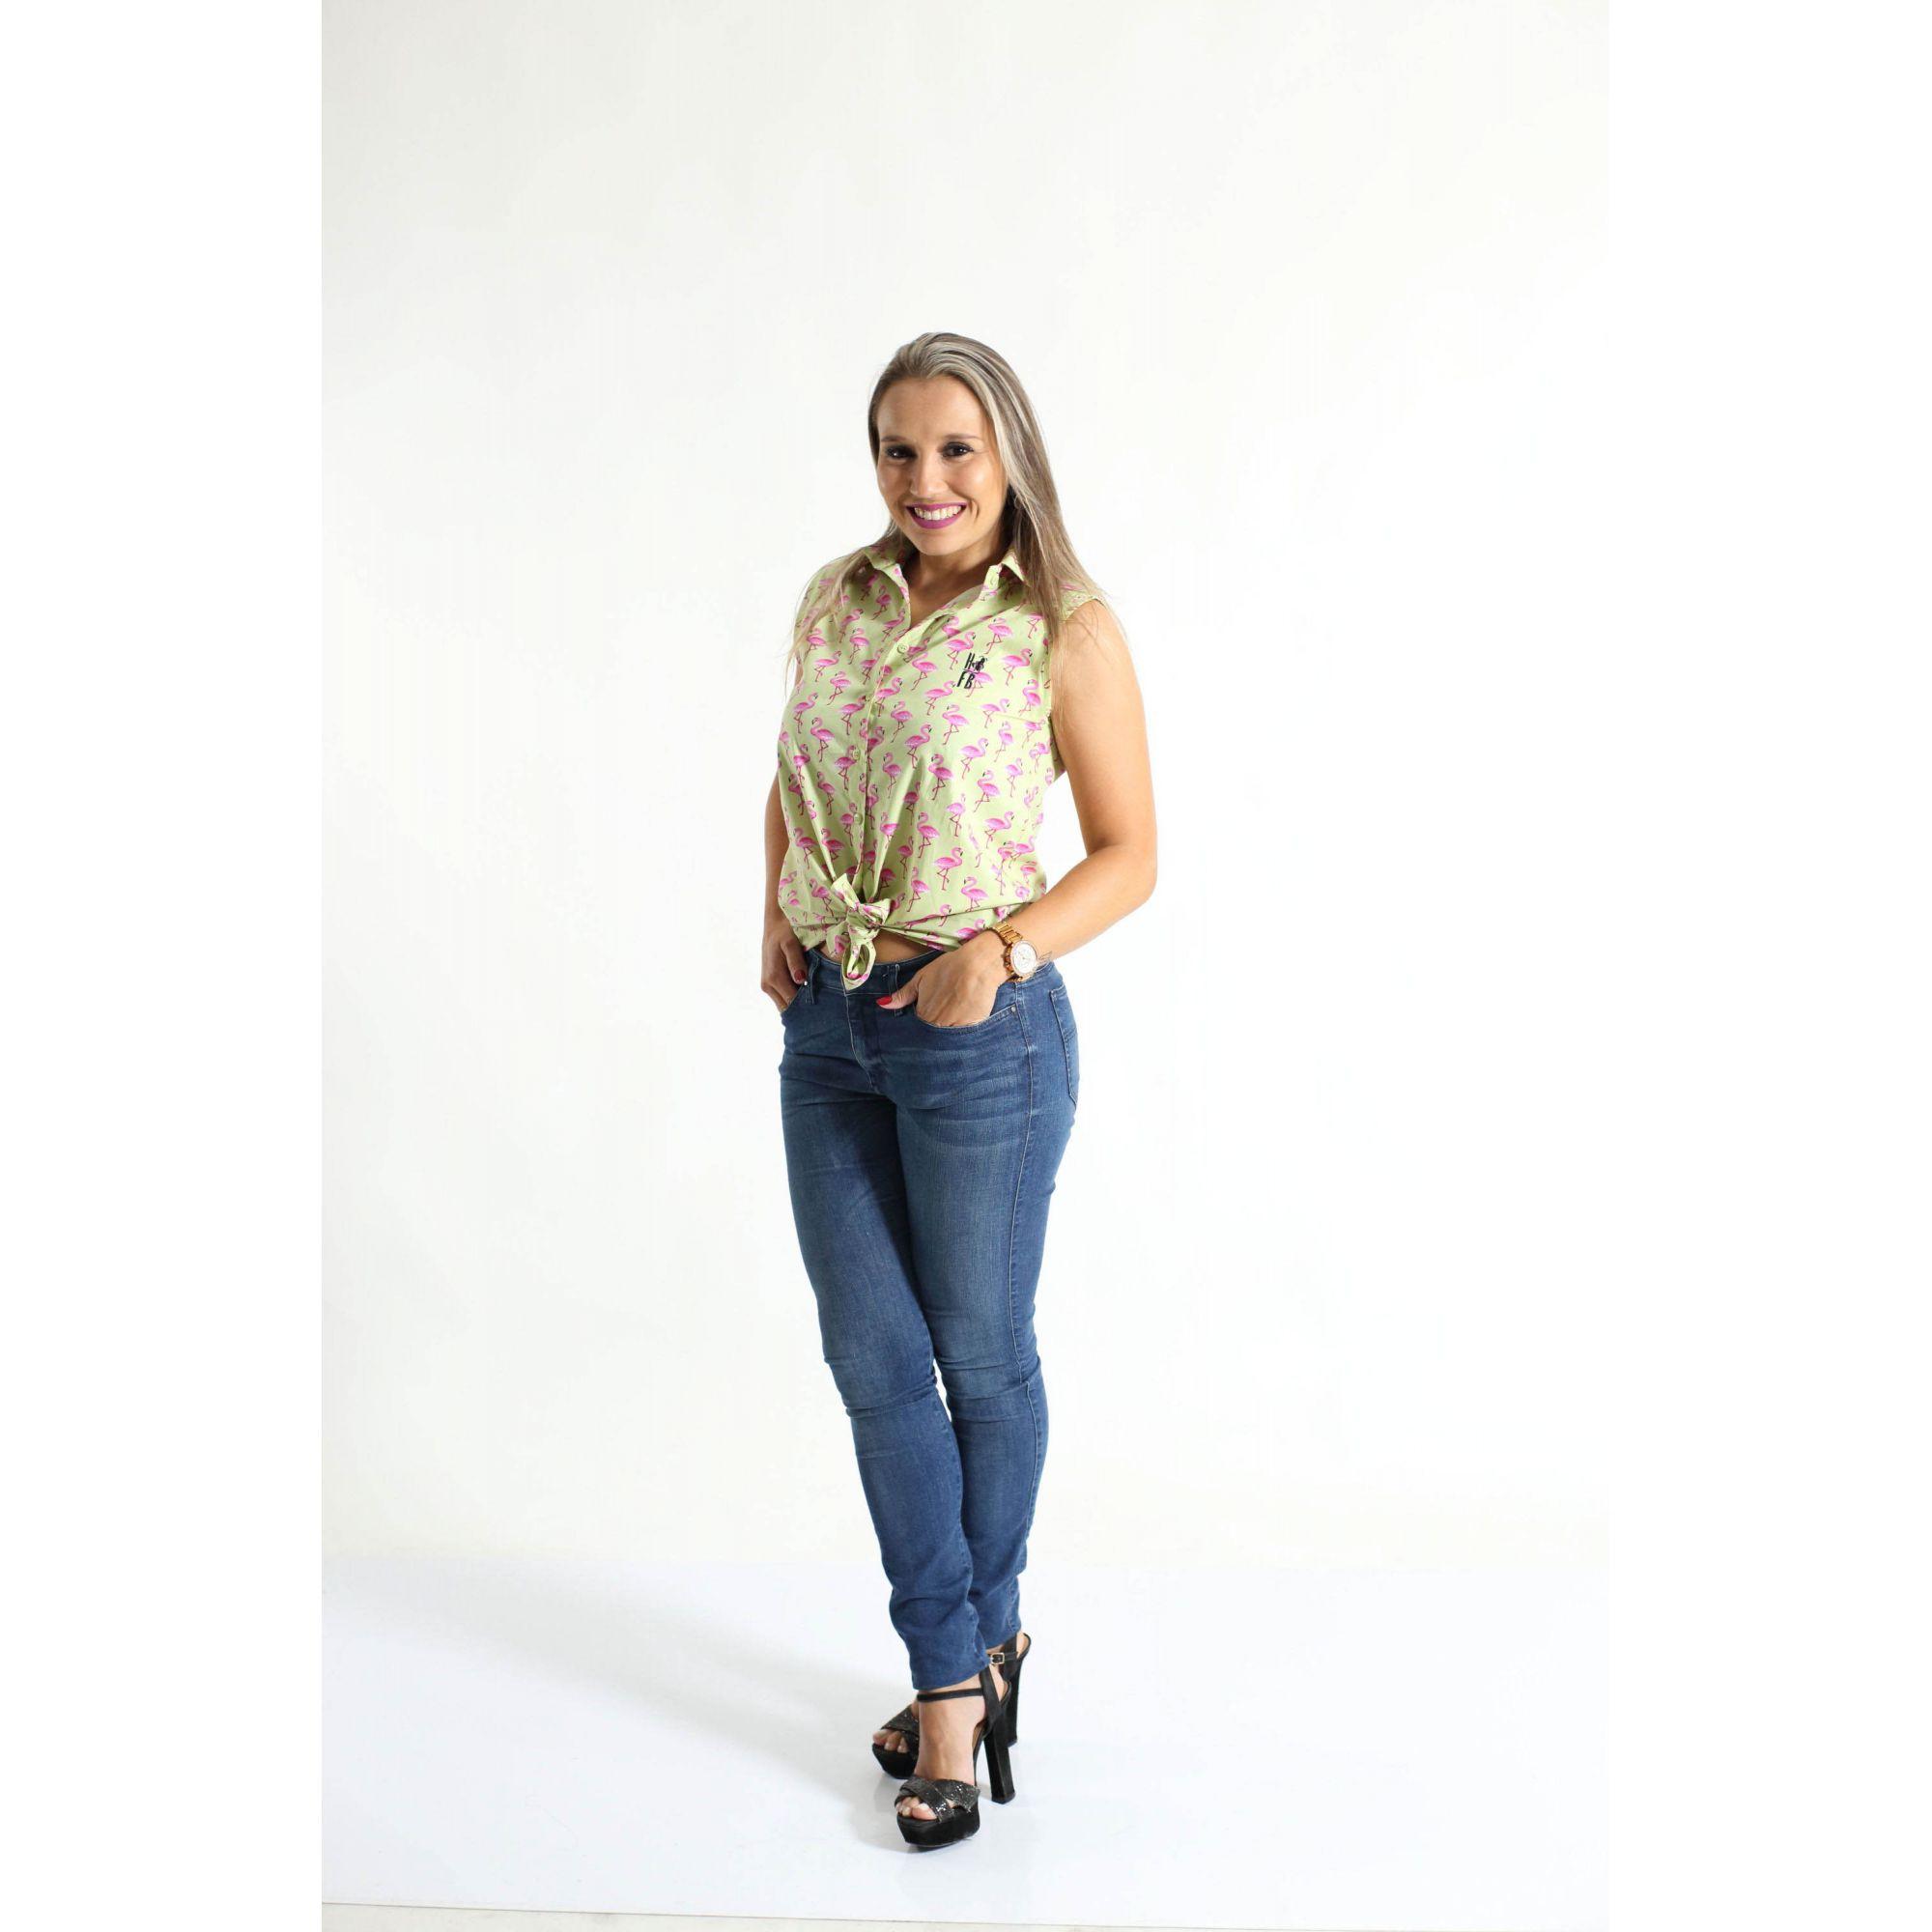 MÃE E FILHA > Kit 02 Camisas Social Adulto e Infantil Flamingos [Coleção Tal Mãe Tal Filha]  - Heitor Fashion Brazil